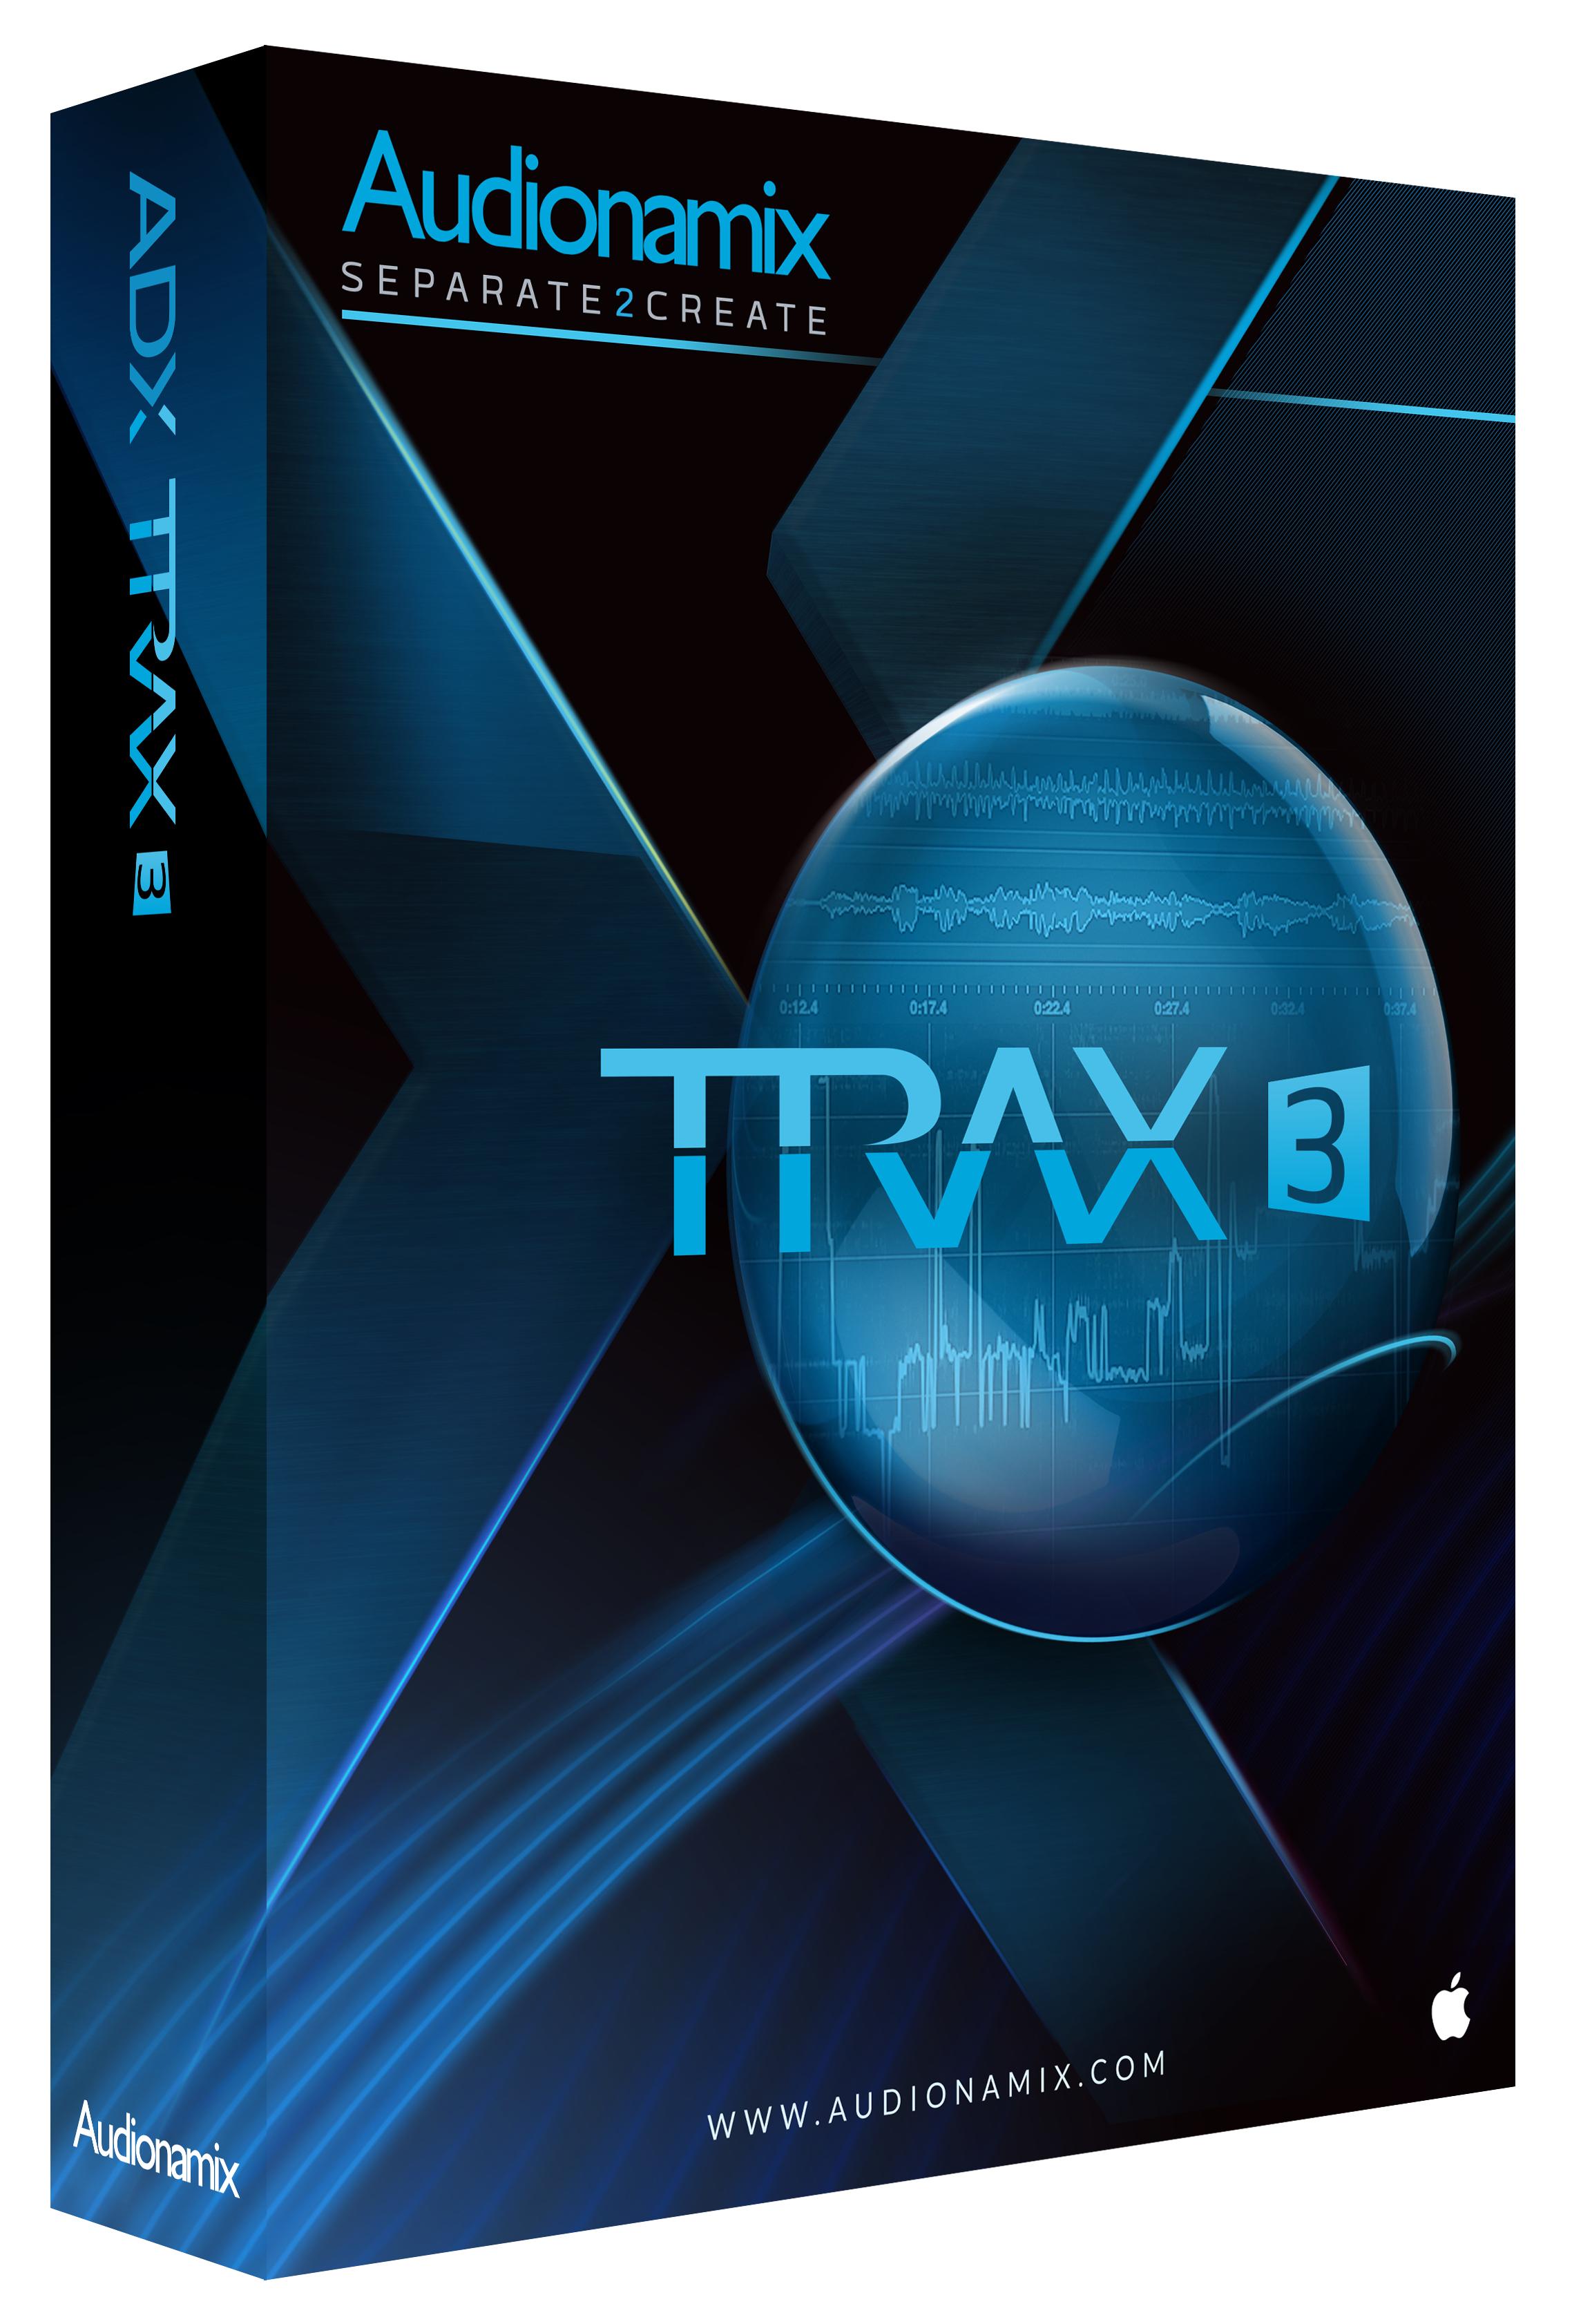 ADX TRAX 3